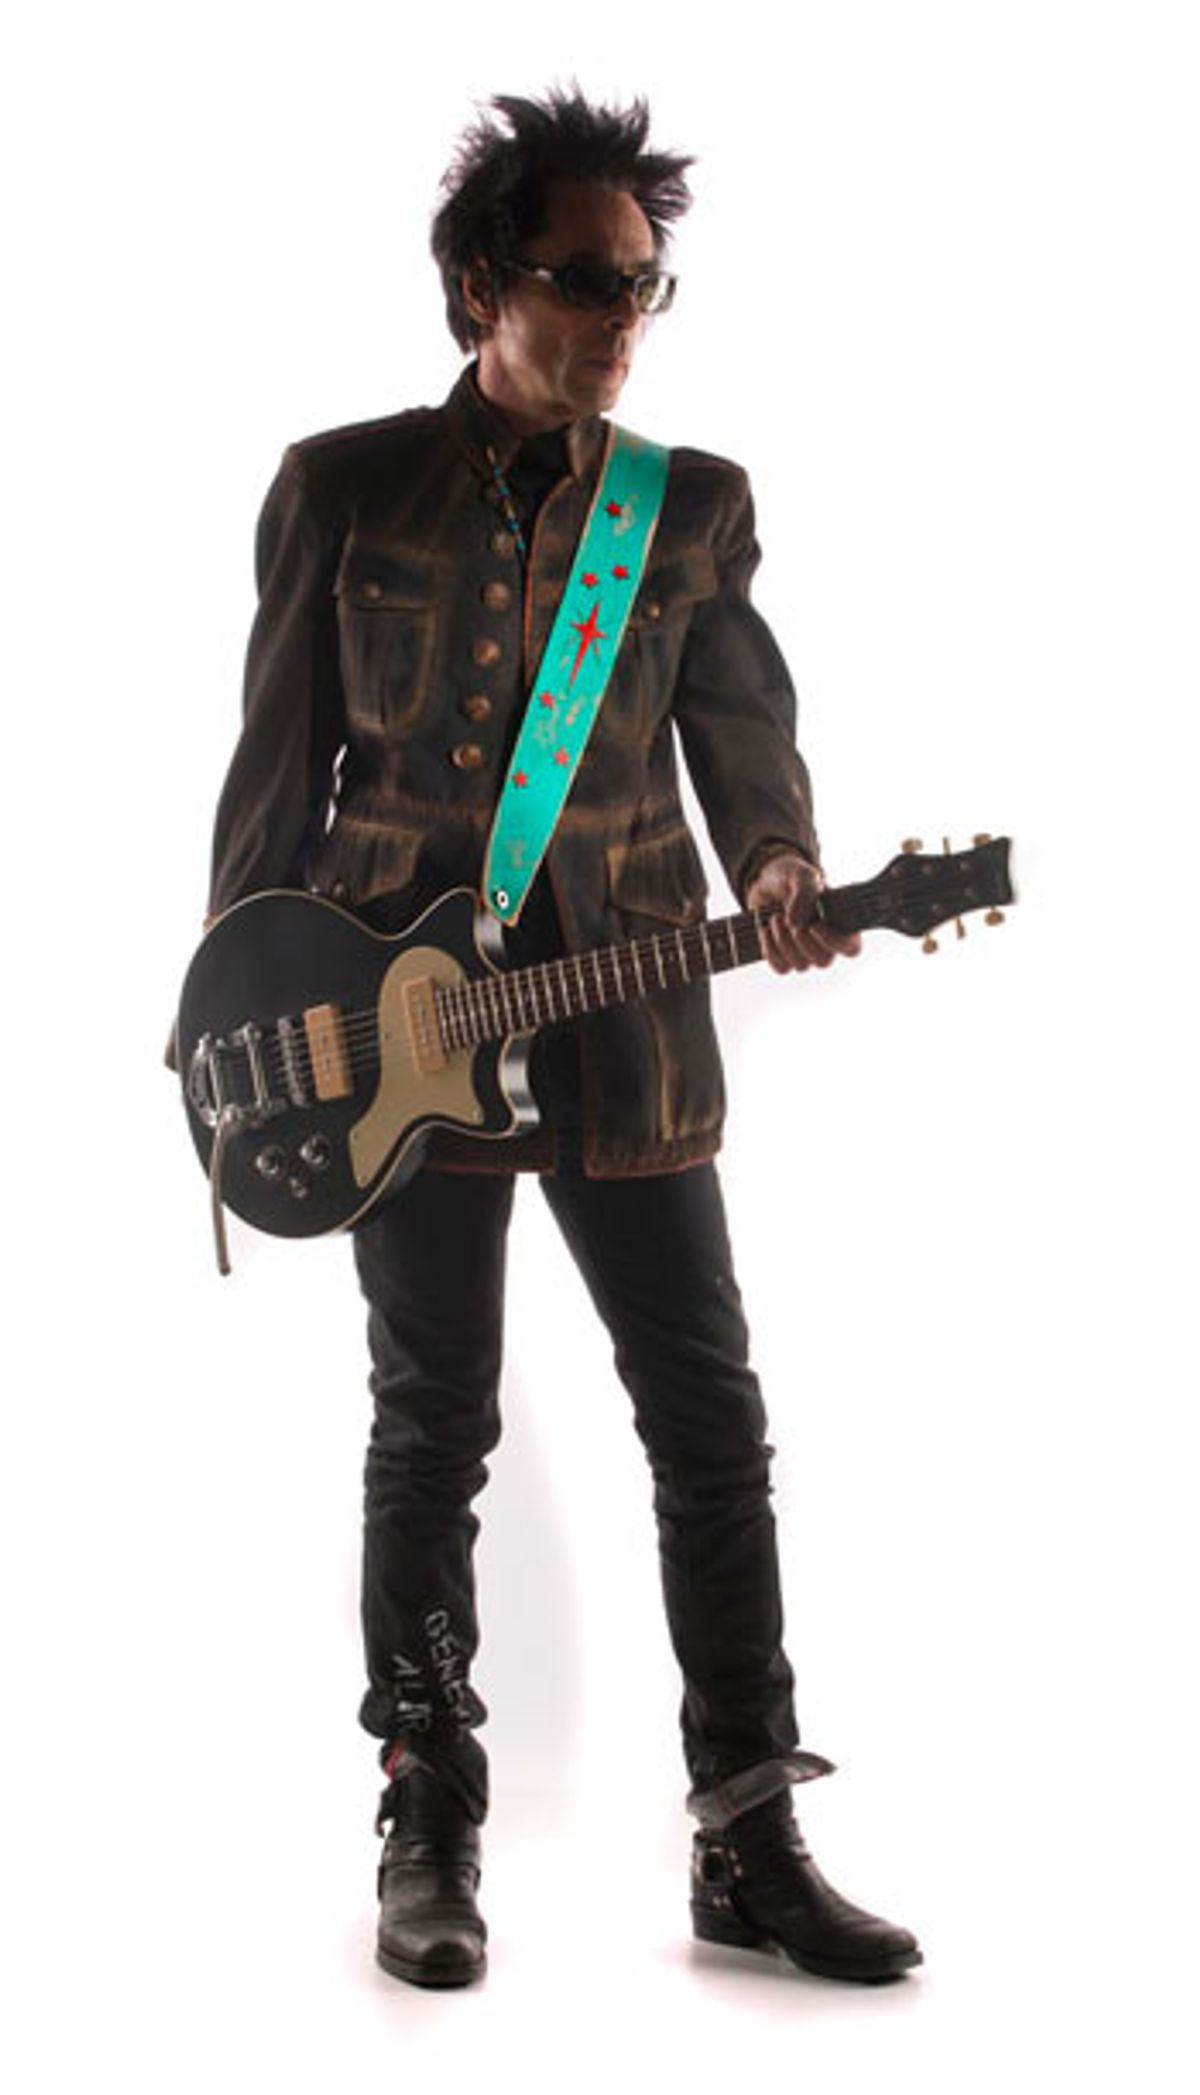 GuitarFetish Introduces Earl Slick's Slickstraps